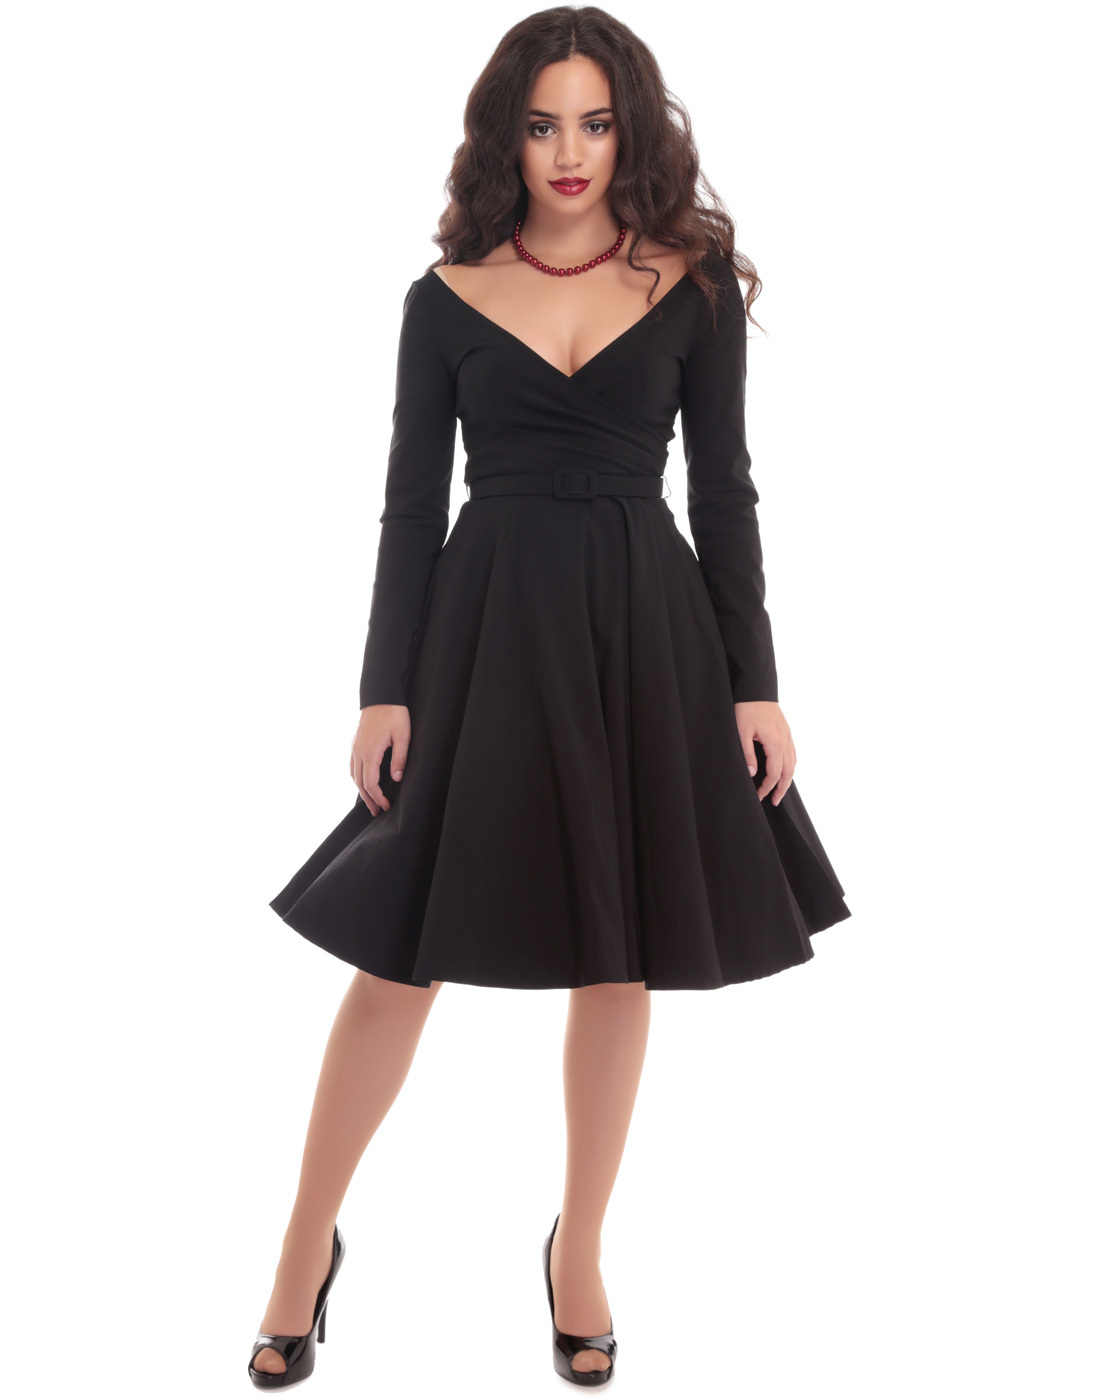 Creative Dresses Sweet Ball Gown Women Flower Dress Black Party Dresses Retro